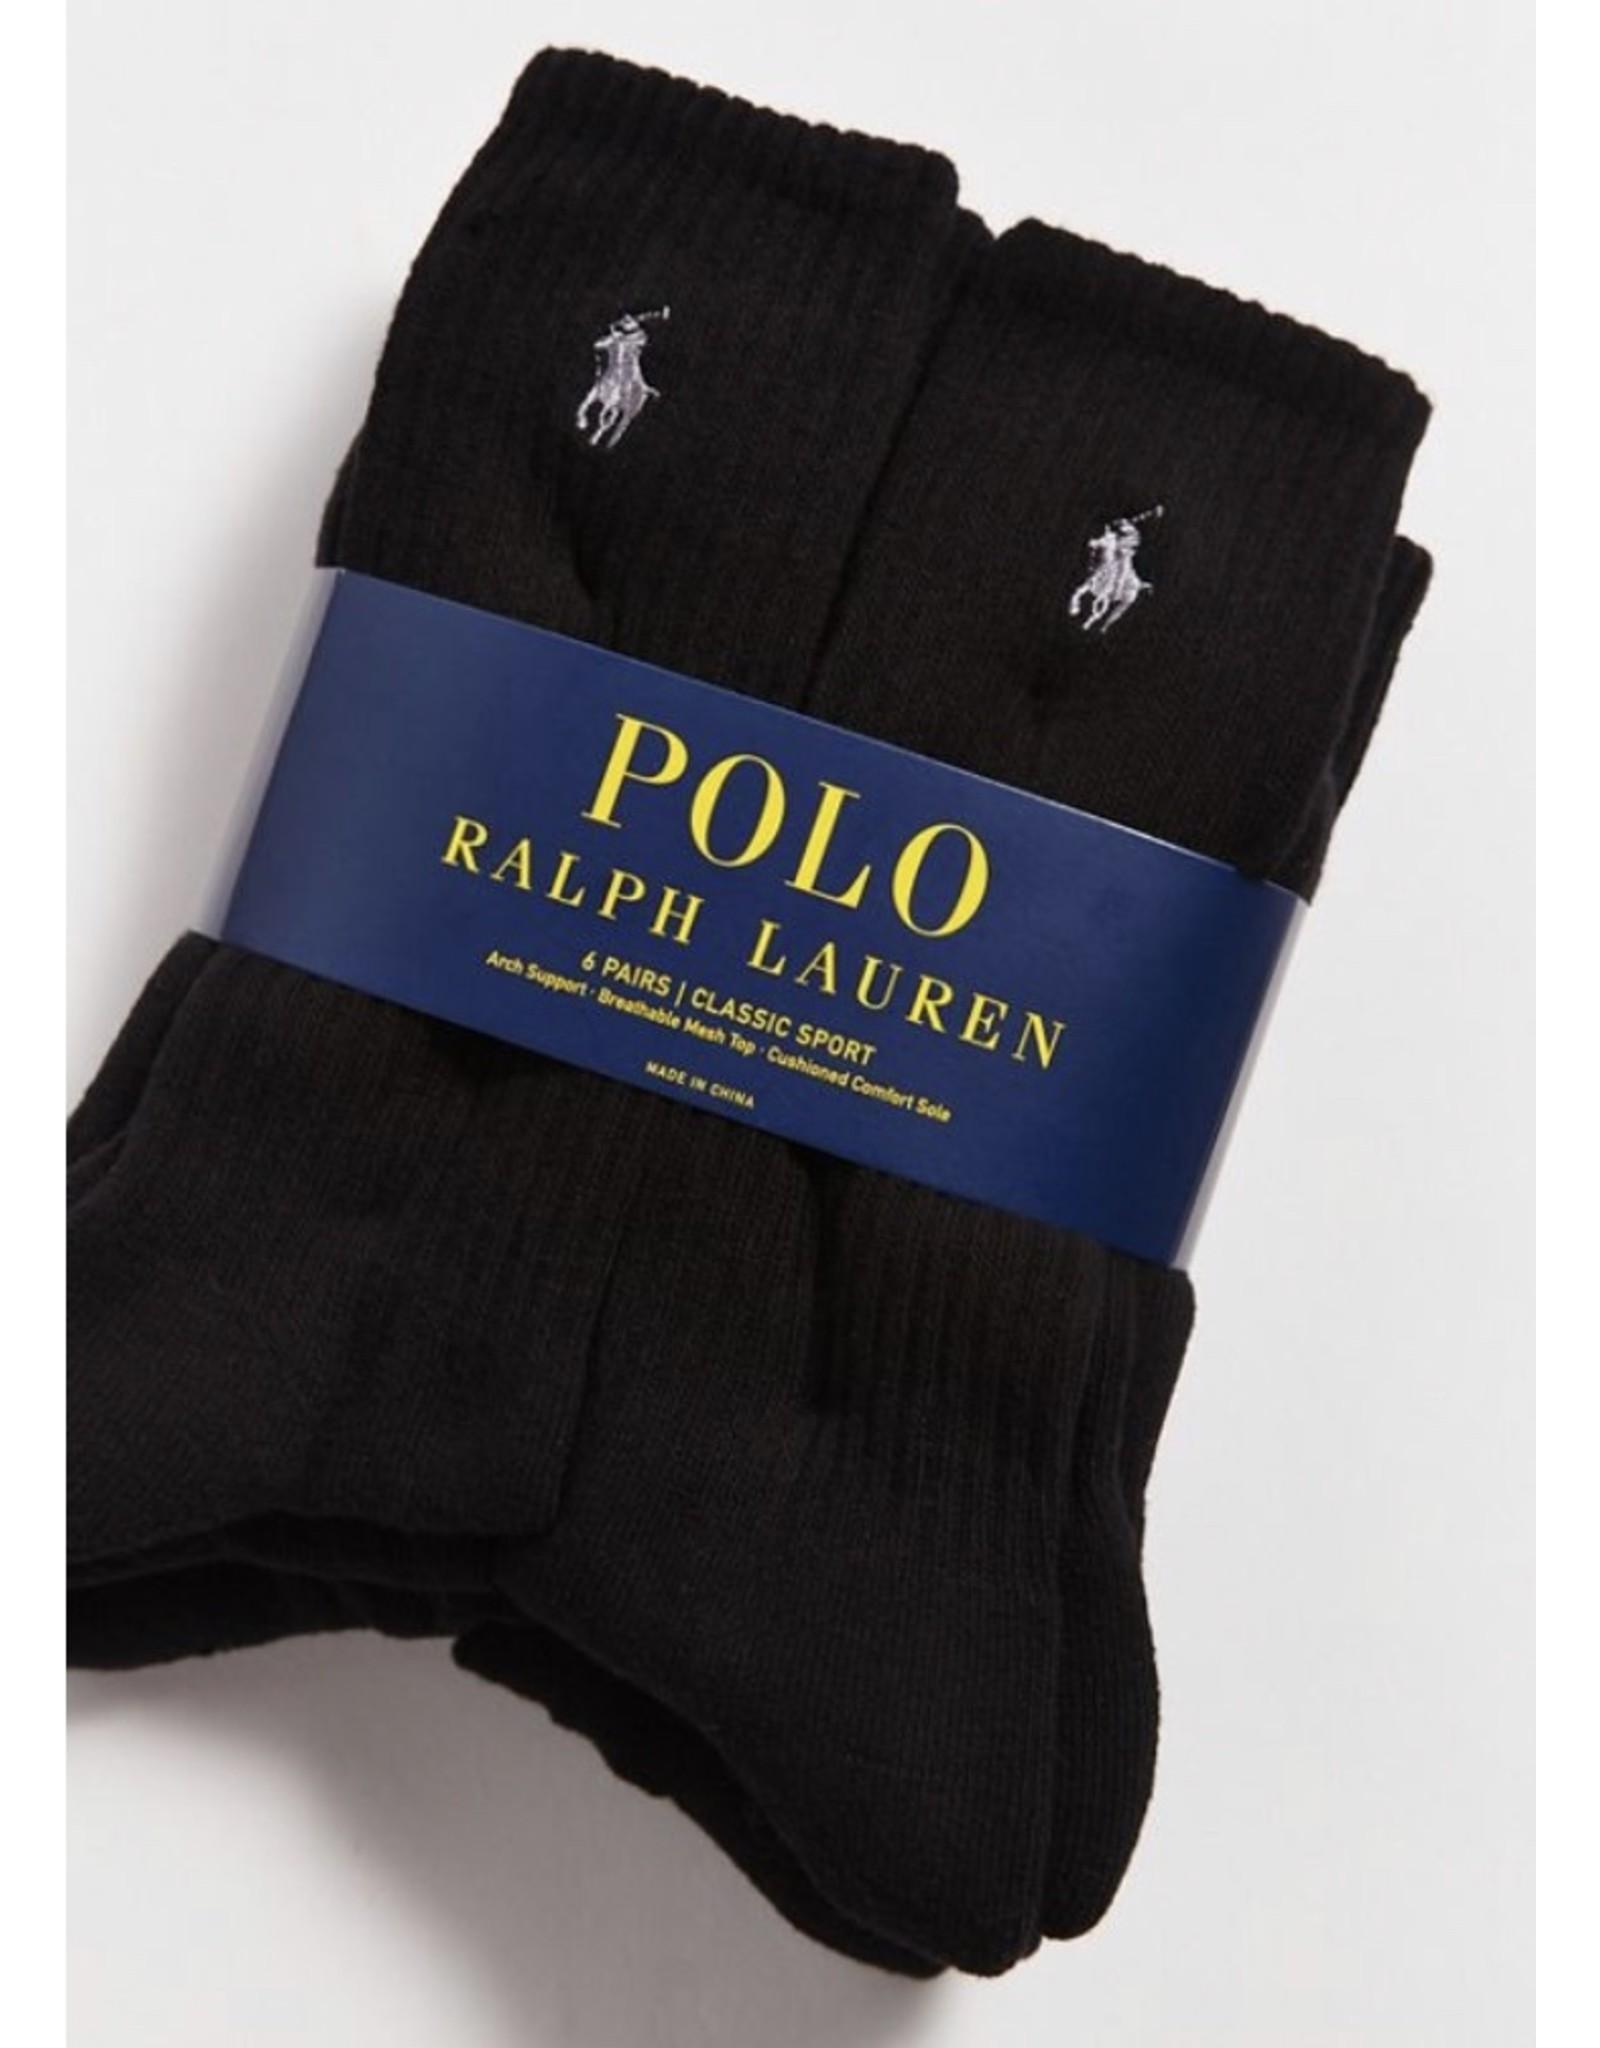 Polo Ralph Lauren Polo Ralph Lauren Men's Crew Cotton Sport Socks 6-Pack